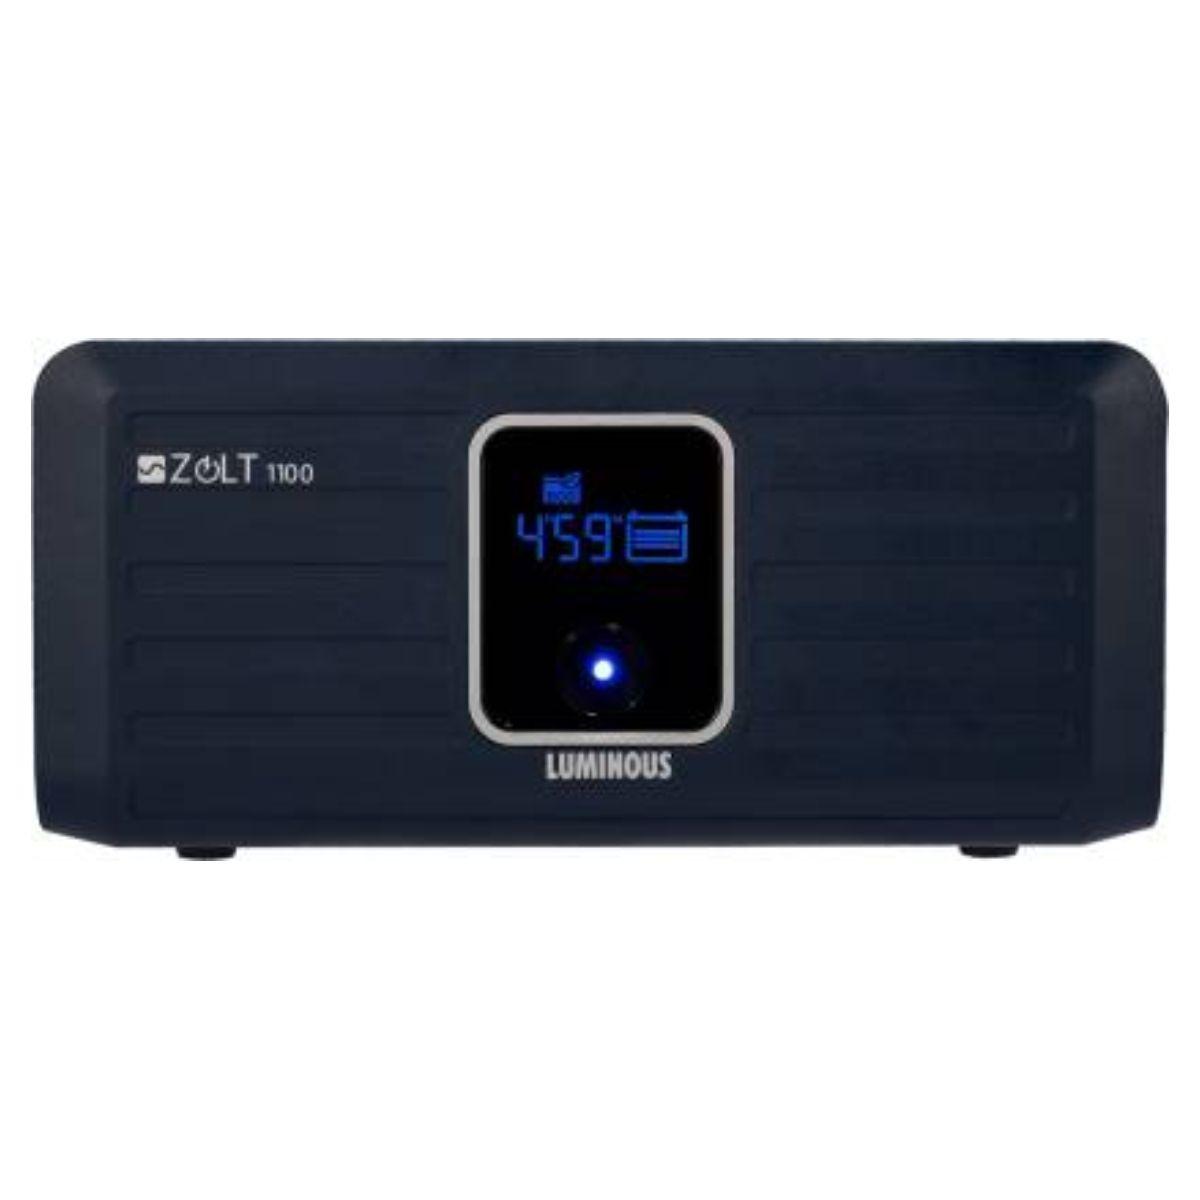 LUMINOUS Zolt 1100 Pure Sine Wave Inverter